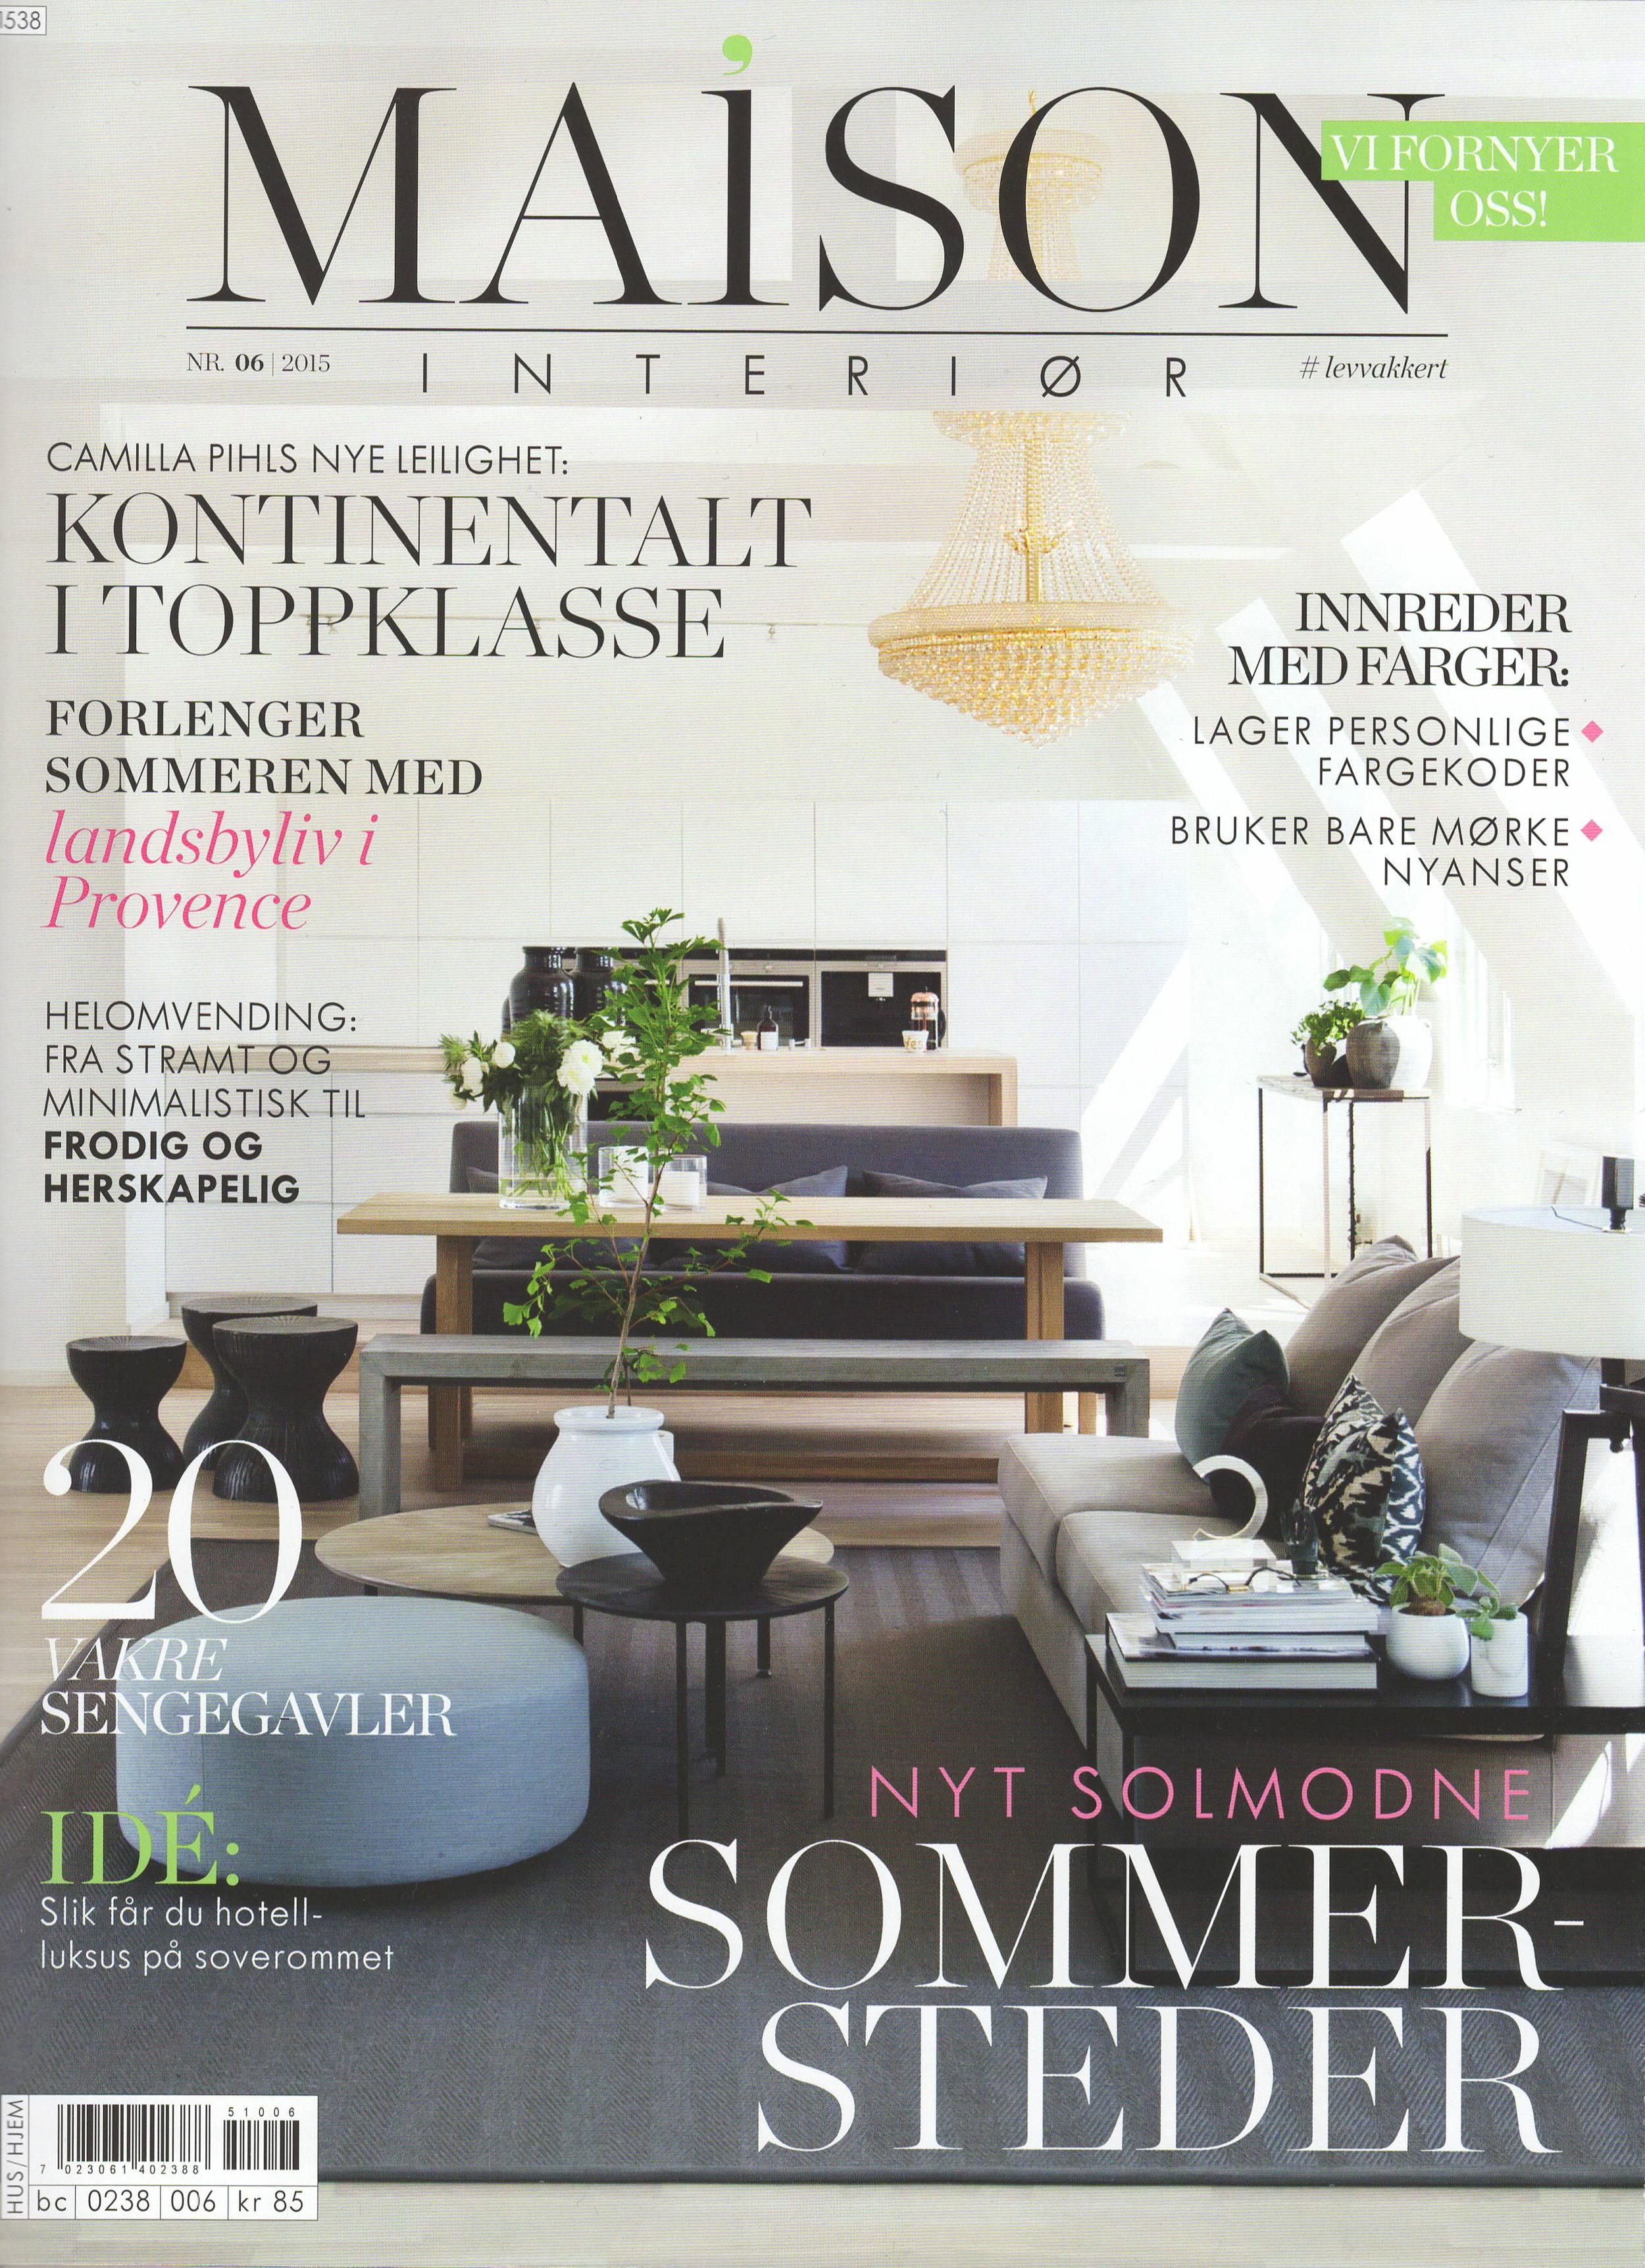 Pott_Sponge_Maison interior_07-15_cover.jpeg